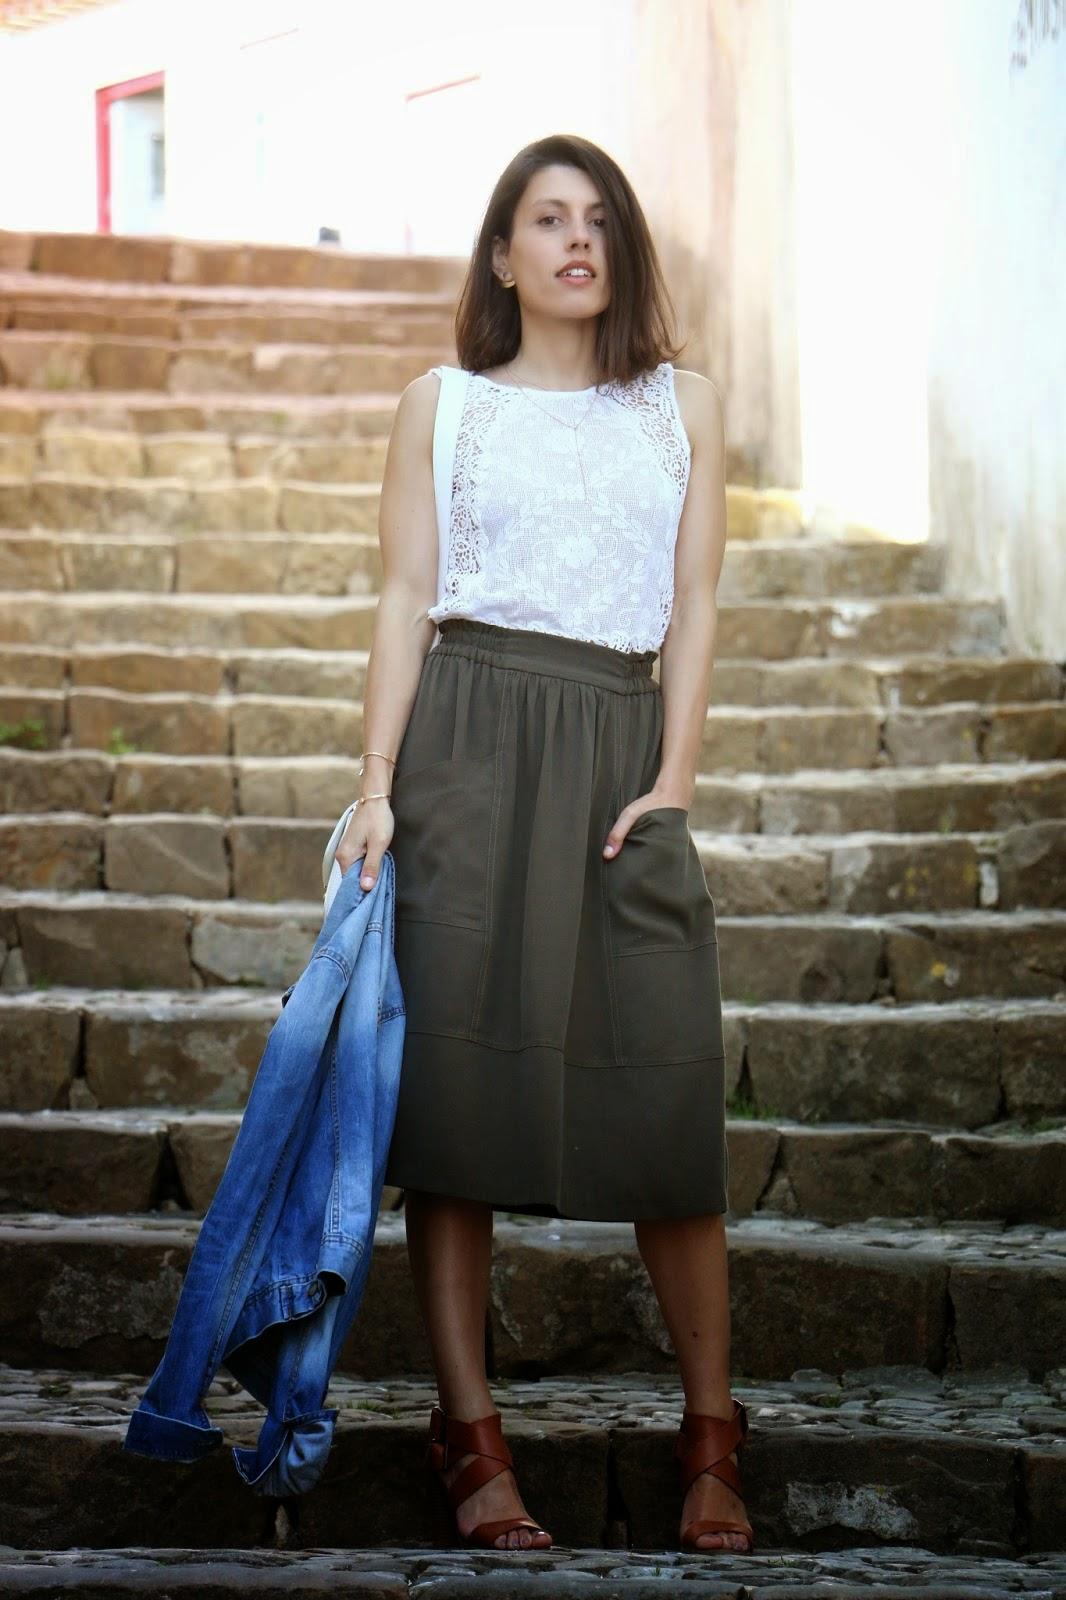 http://ilovefitametrica.blogspot.pt/2015/04/khaki-midi-skirt.html